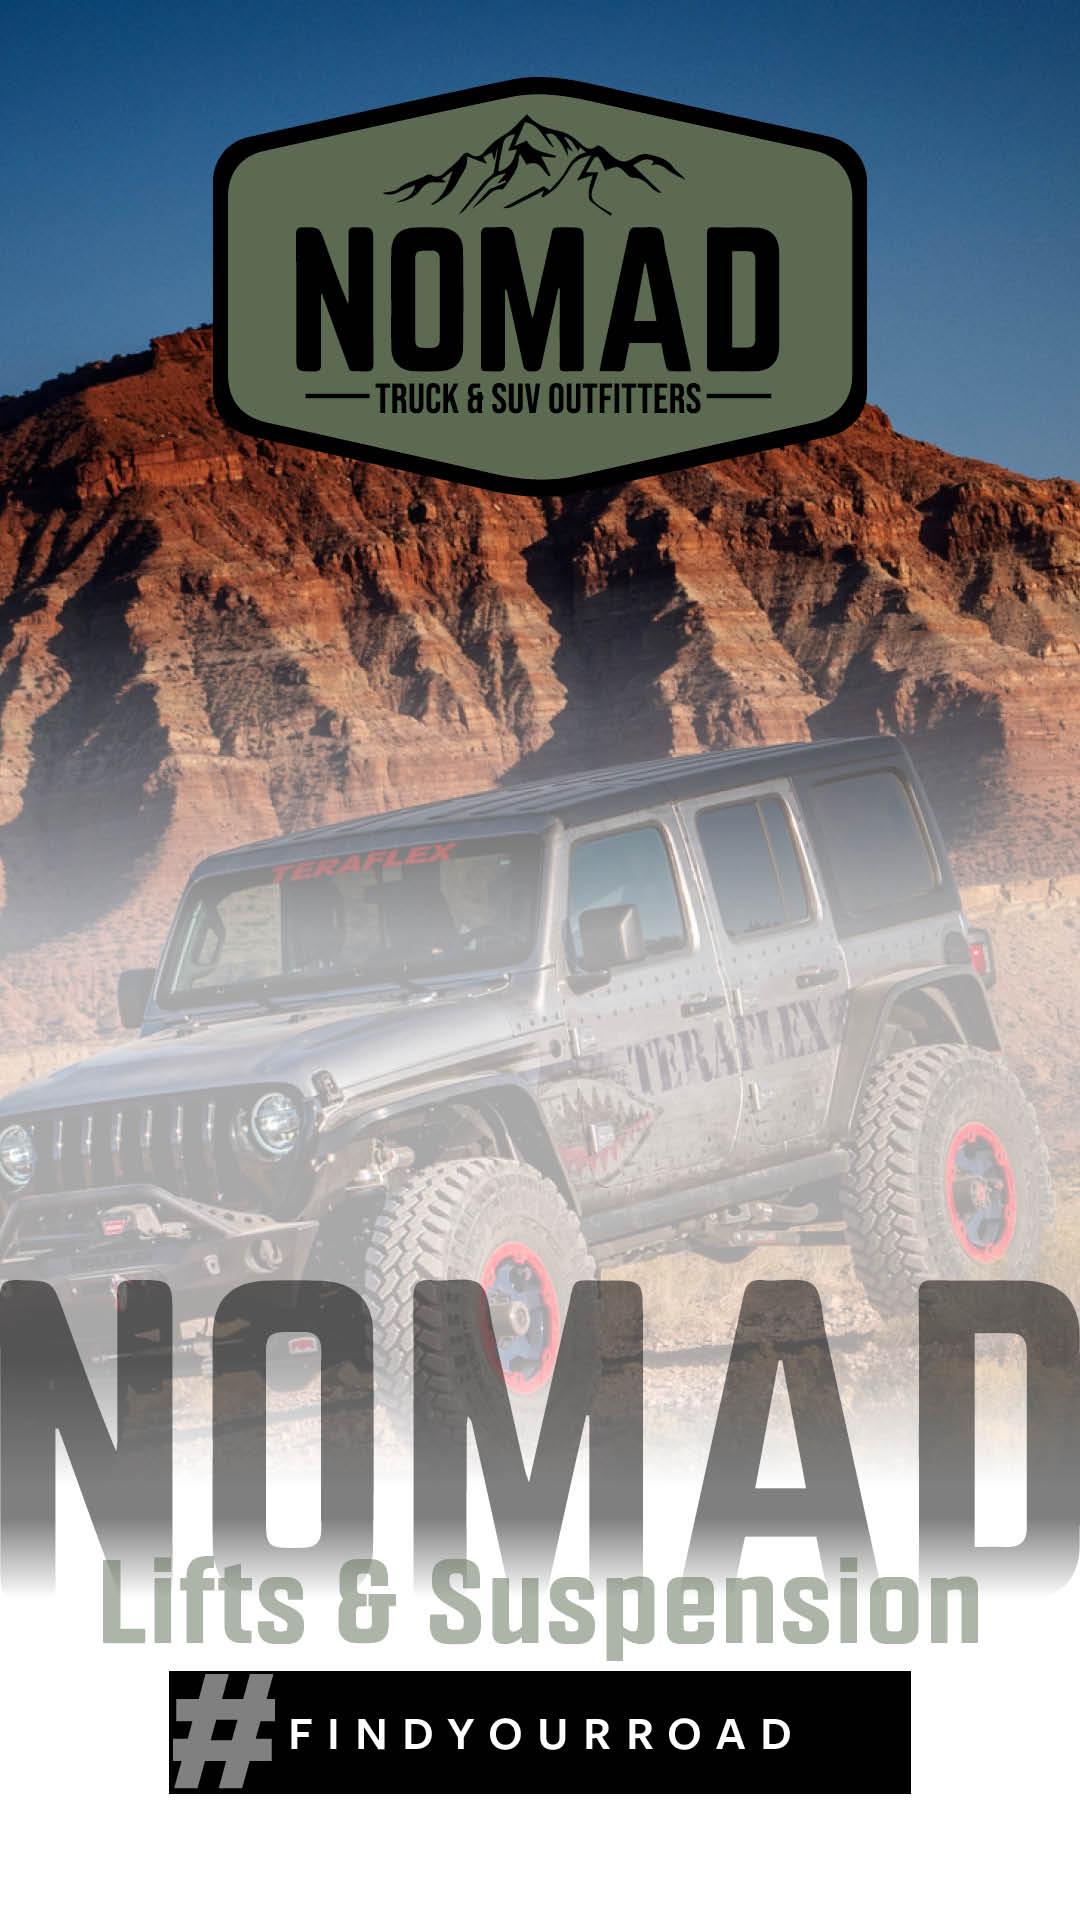 NOMAD_Lifts-Suspension2